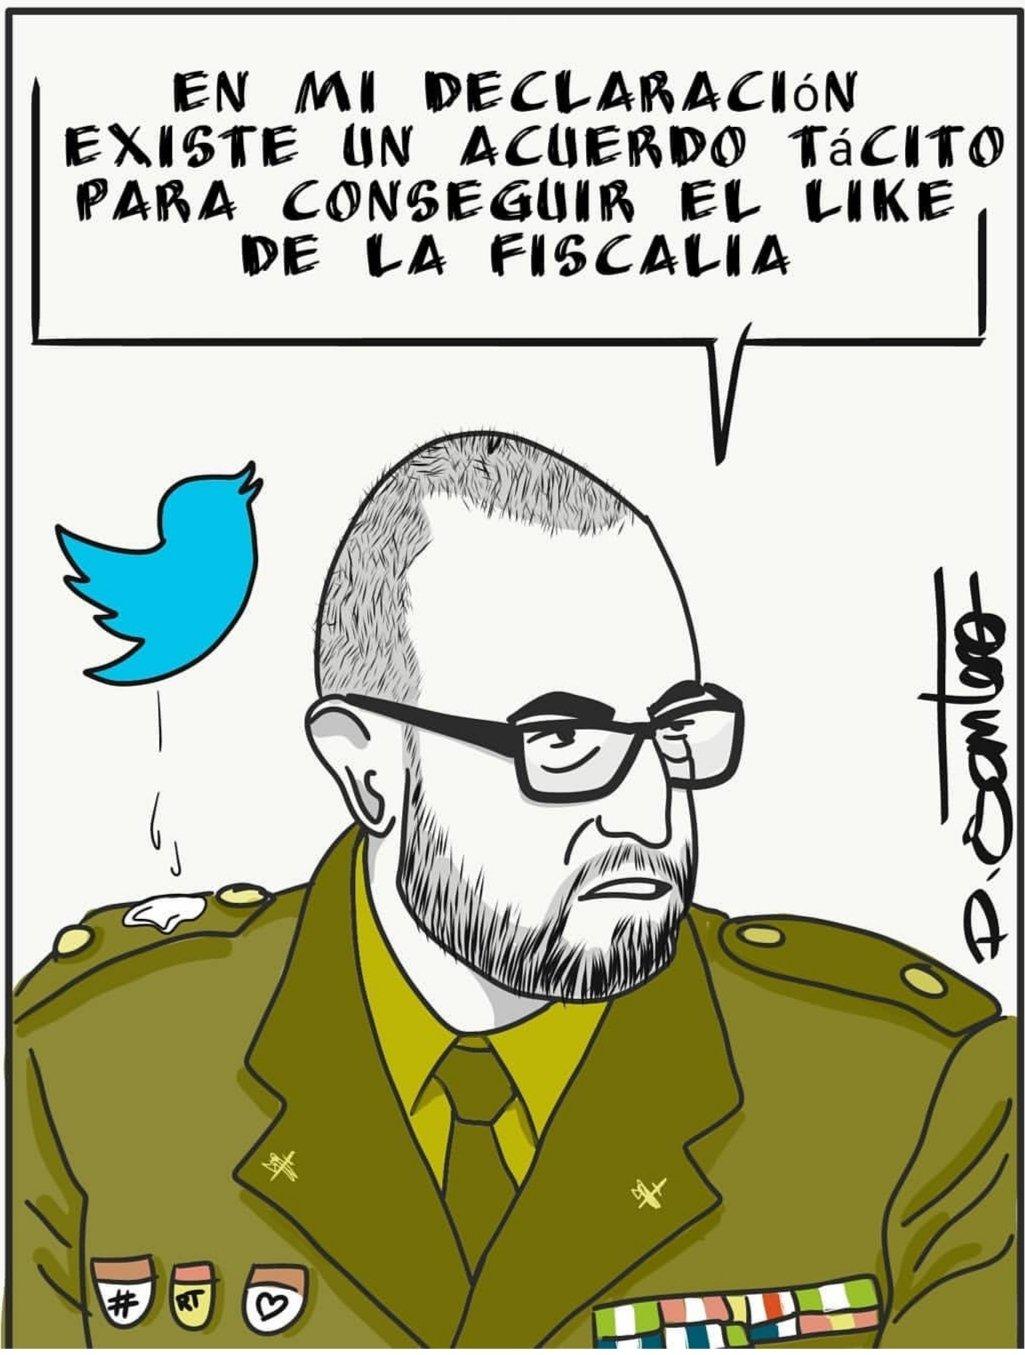 by Paco Santero